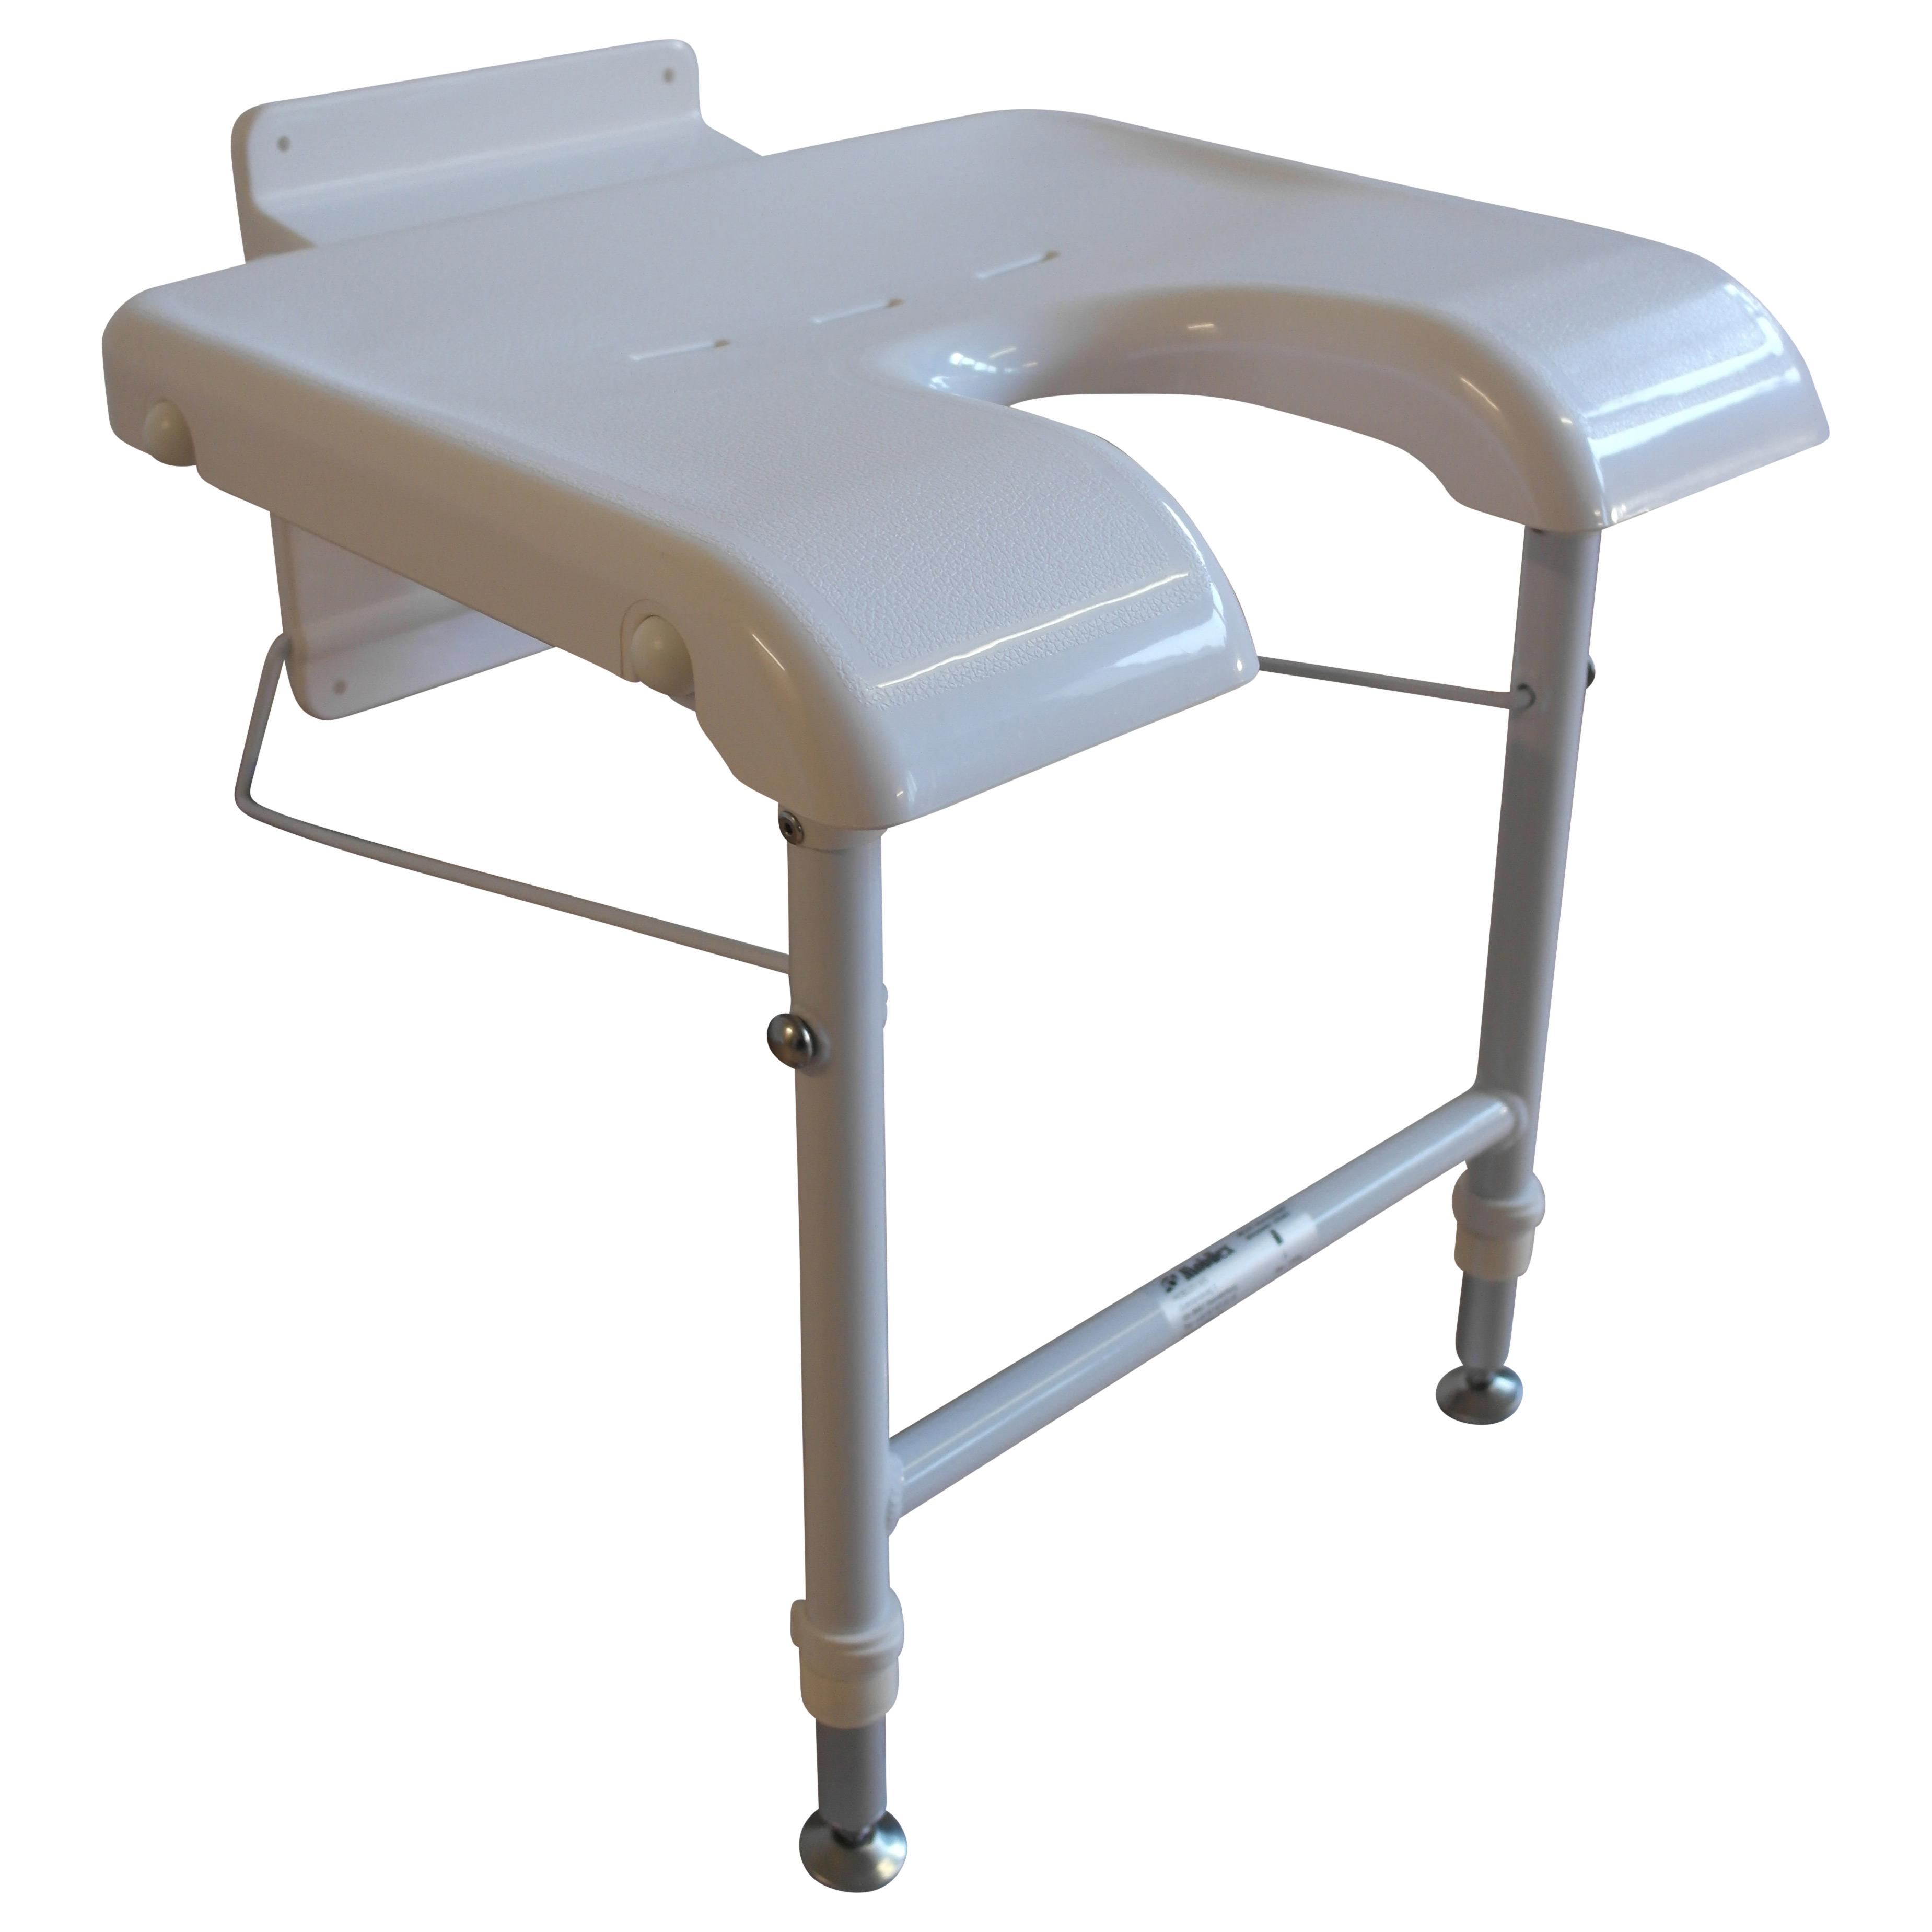 Væghængt badestol – pris 800.00